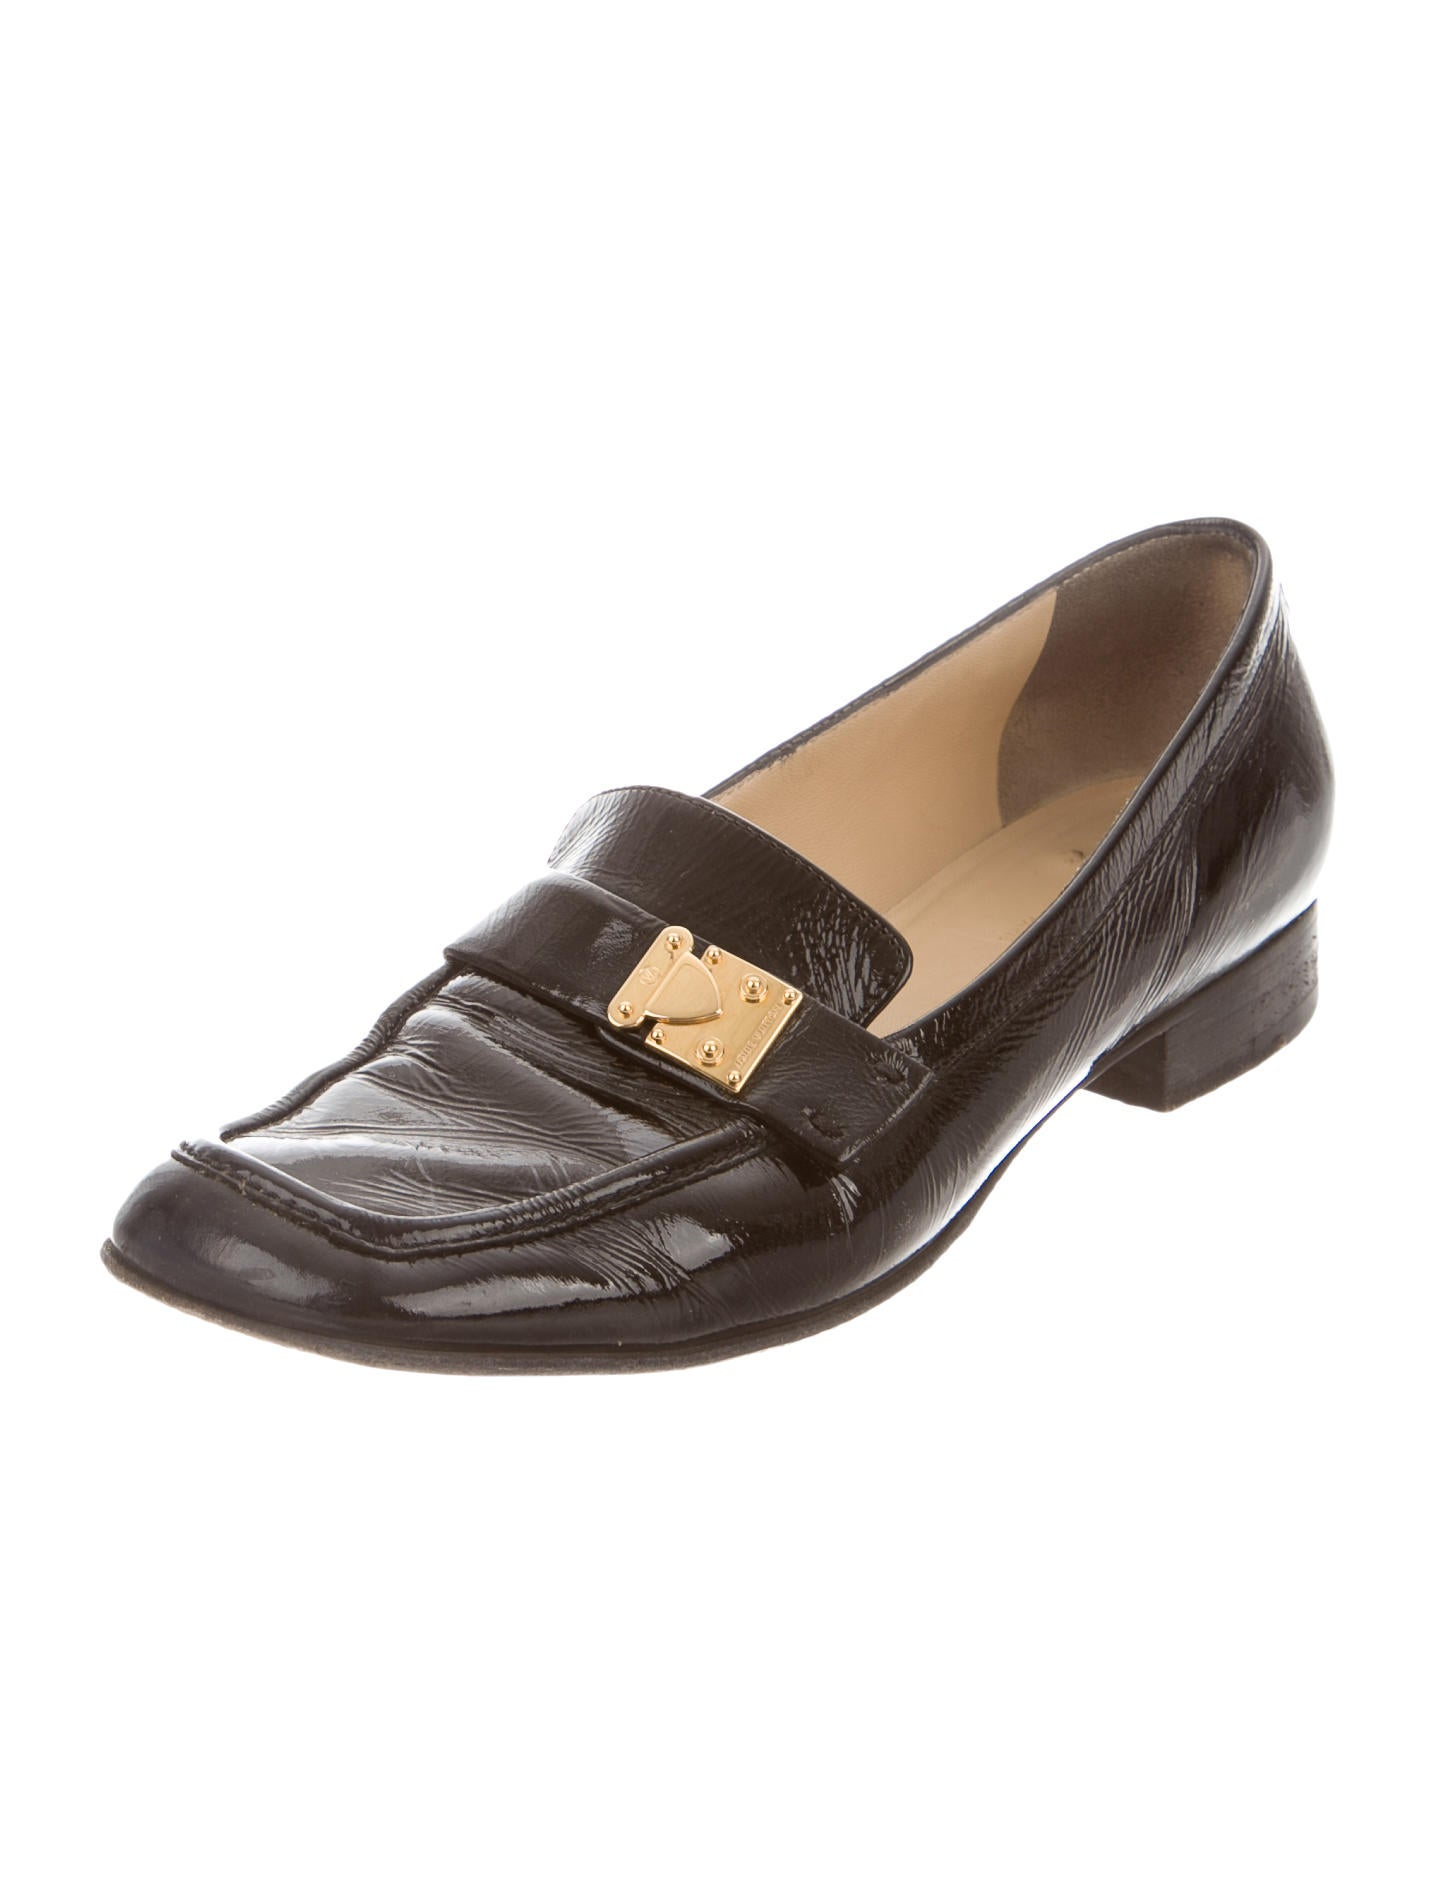 Louis Vuitton Womens Driving Shoes